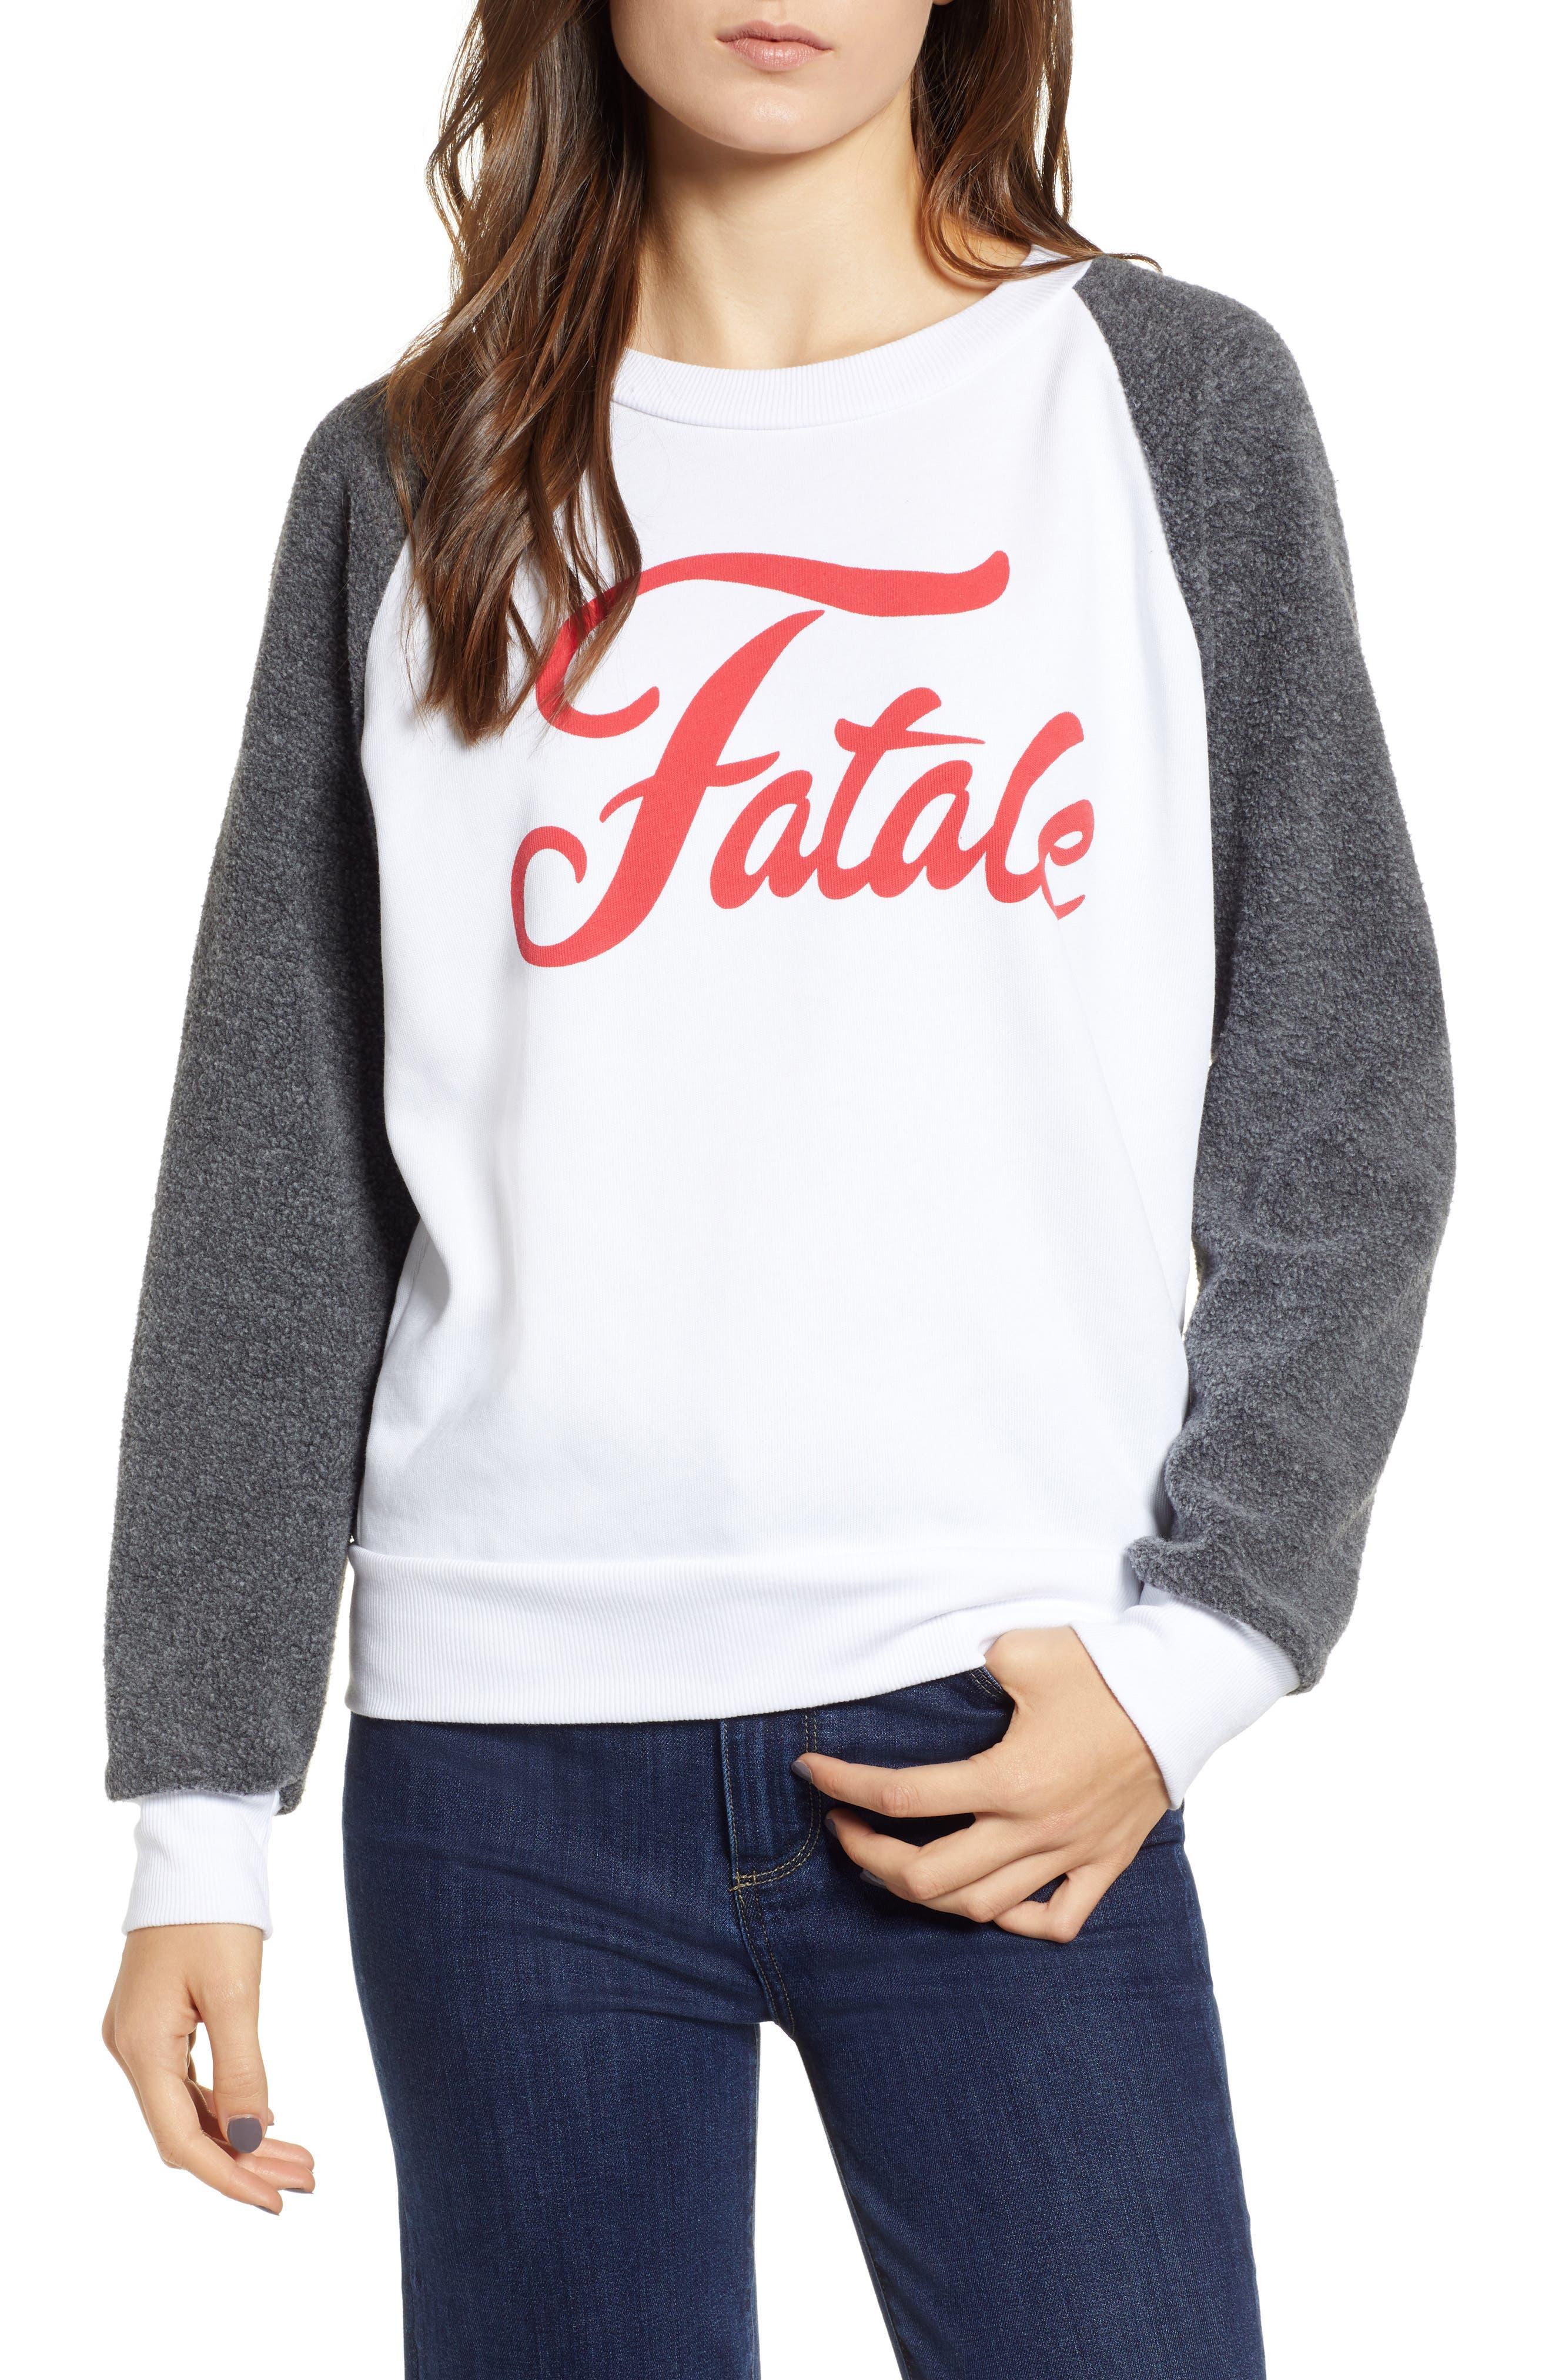 Fatale Fleece Sleeve Sweatshirt,                             Main thumbnail 1, color,                             CLEAN WHITE/ CLEAN BLACK